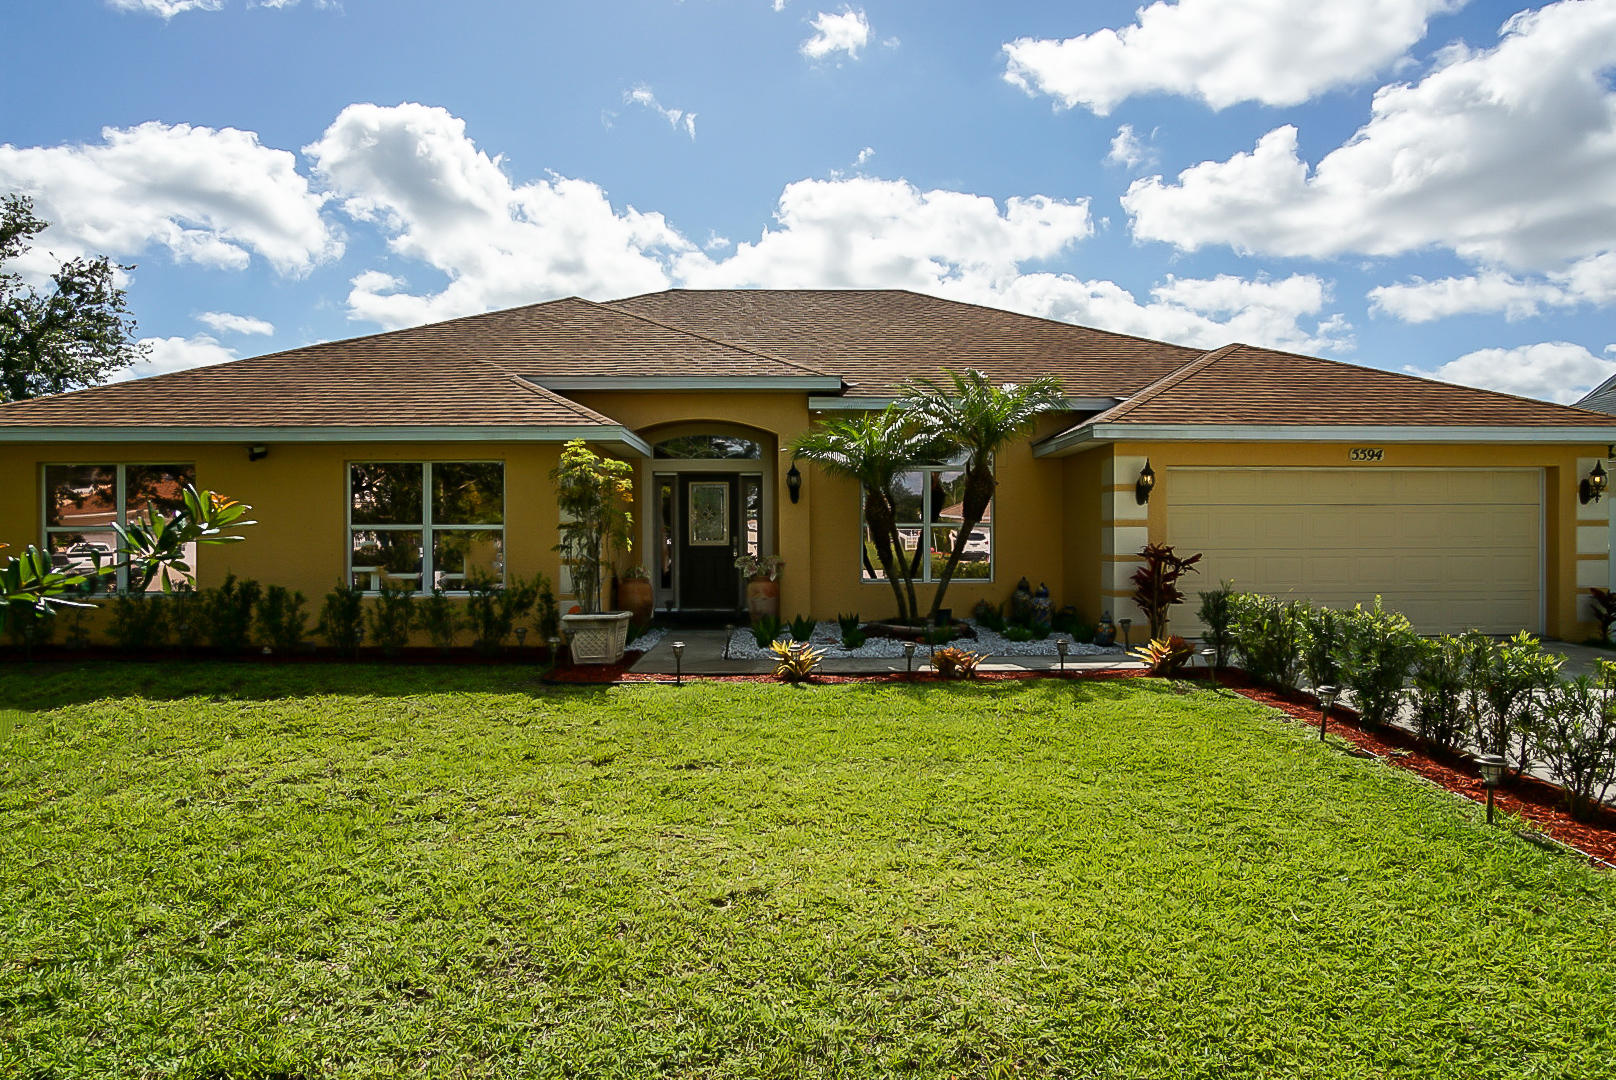 5594 Nw North Crisona Circle, Saint Lucie West, FL 34986